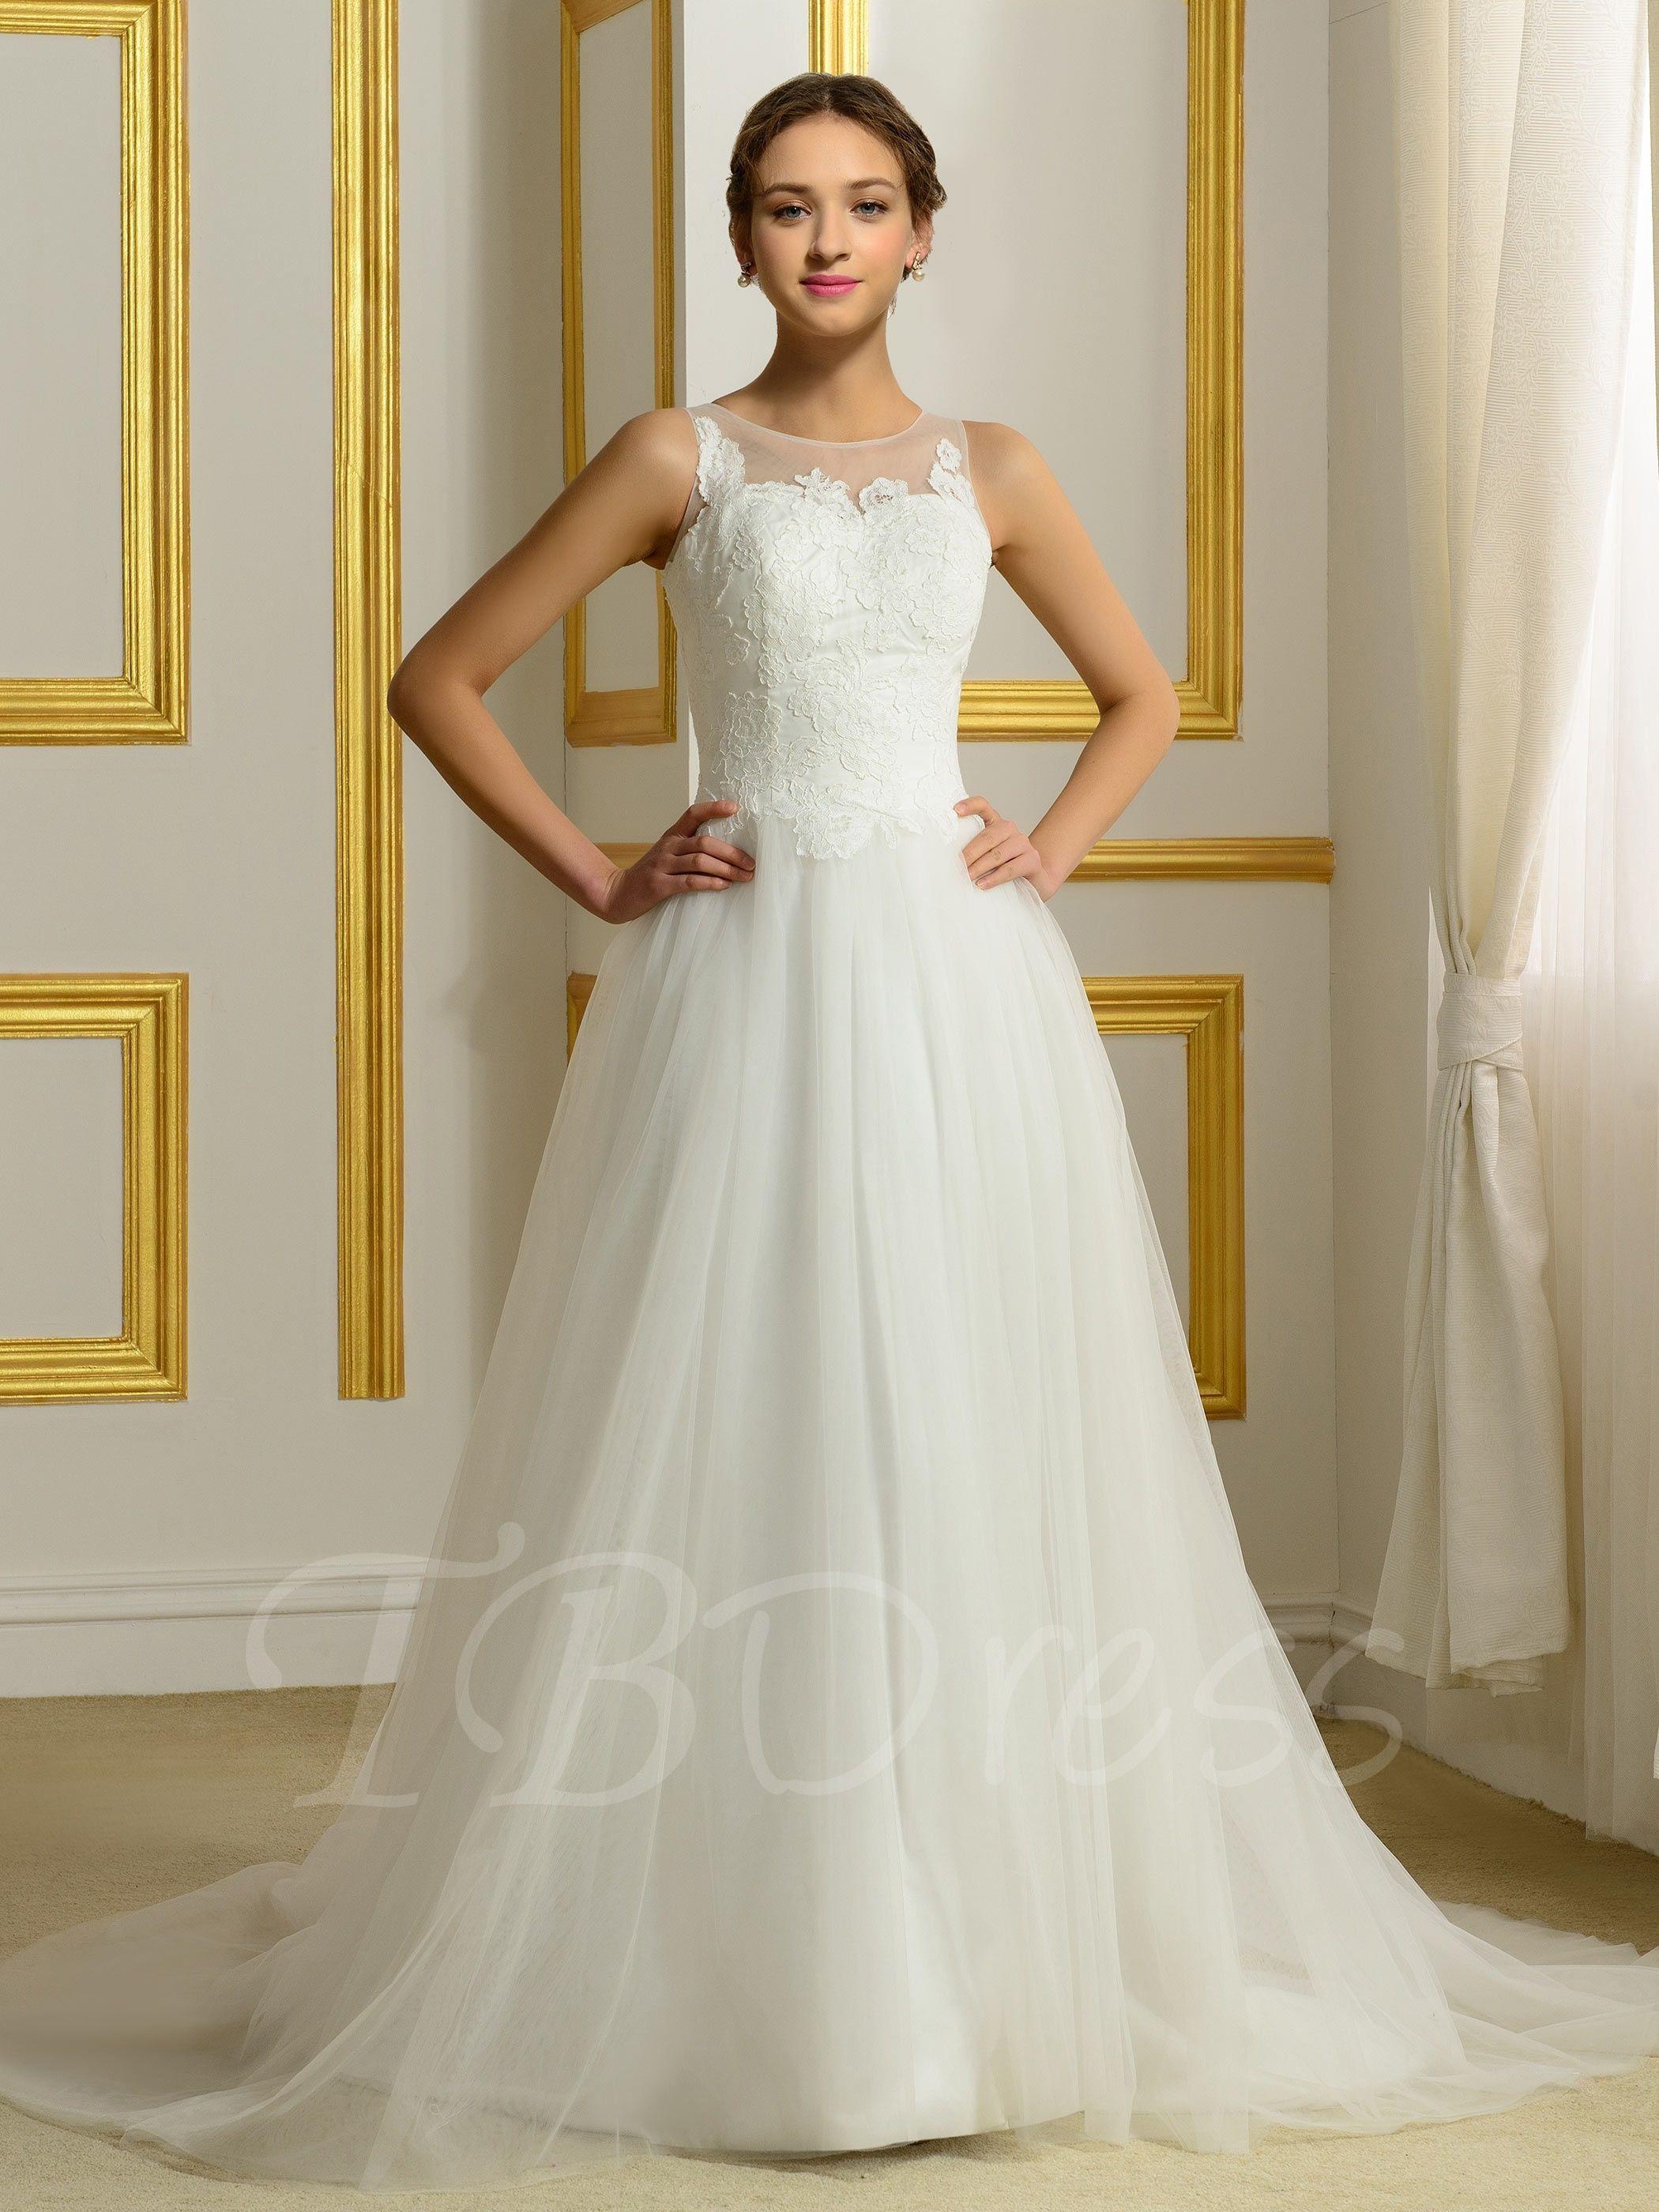 Jewel neck appliques aline wedding dress jewel wedding dress and